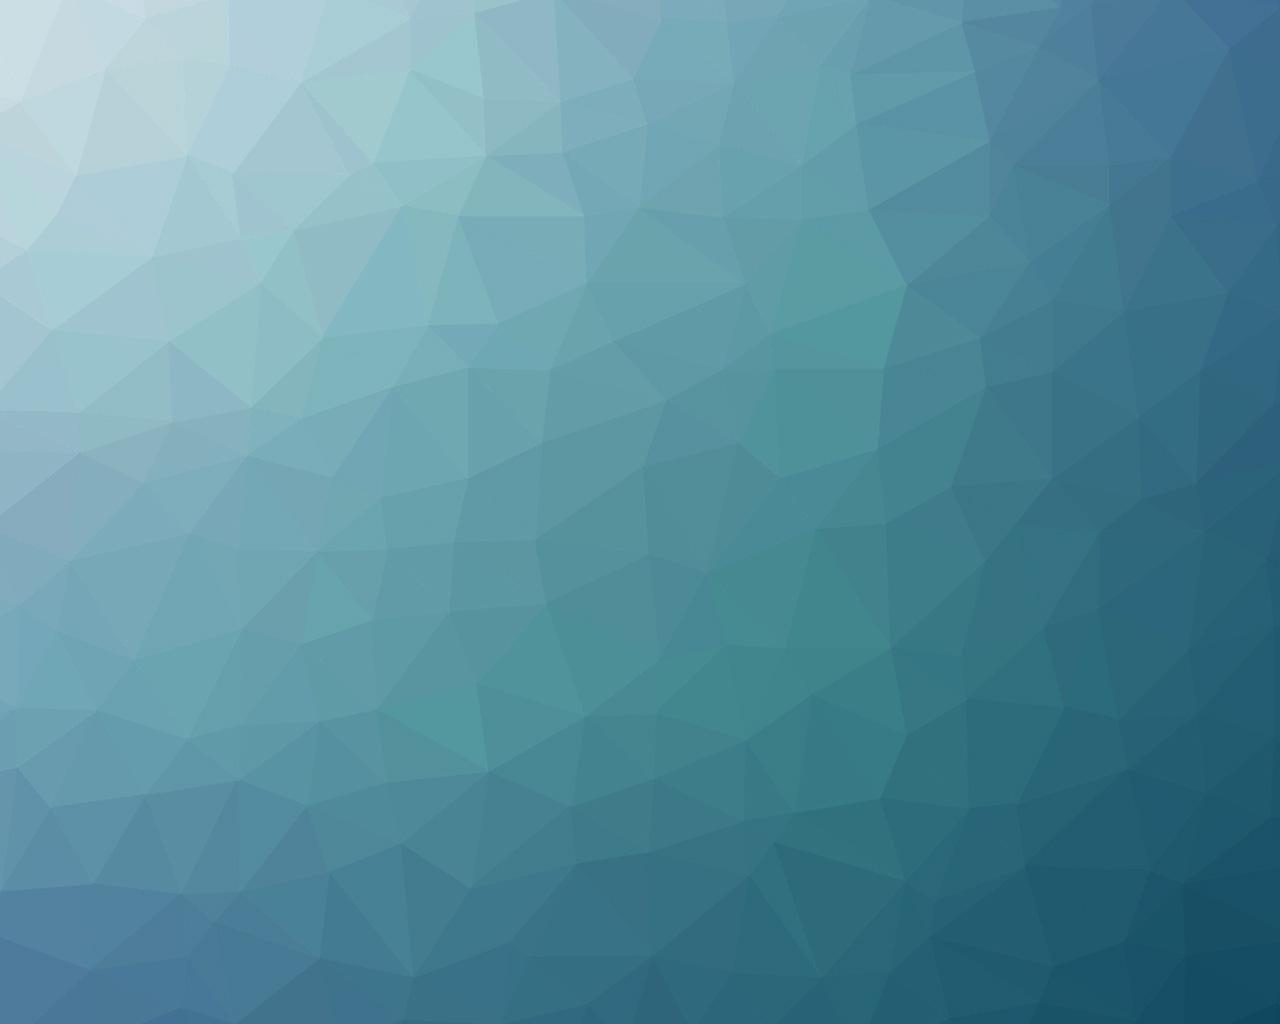 wallpaper for desktop, laptop   vp66-polygon-blue-green ...